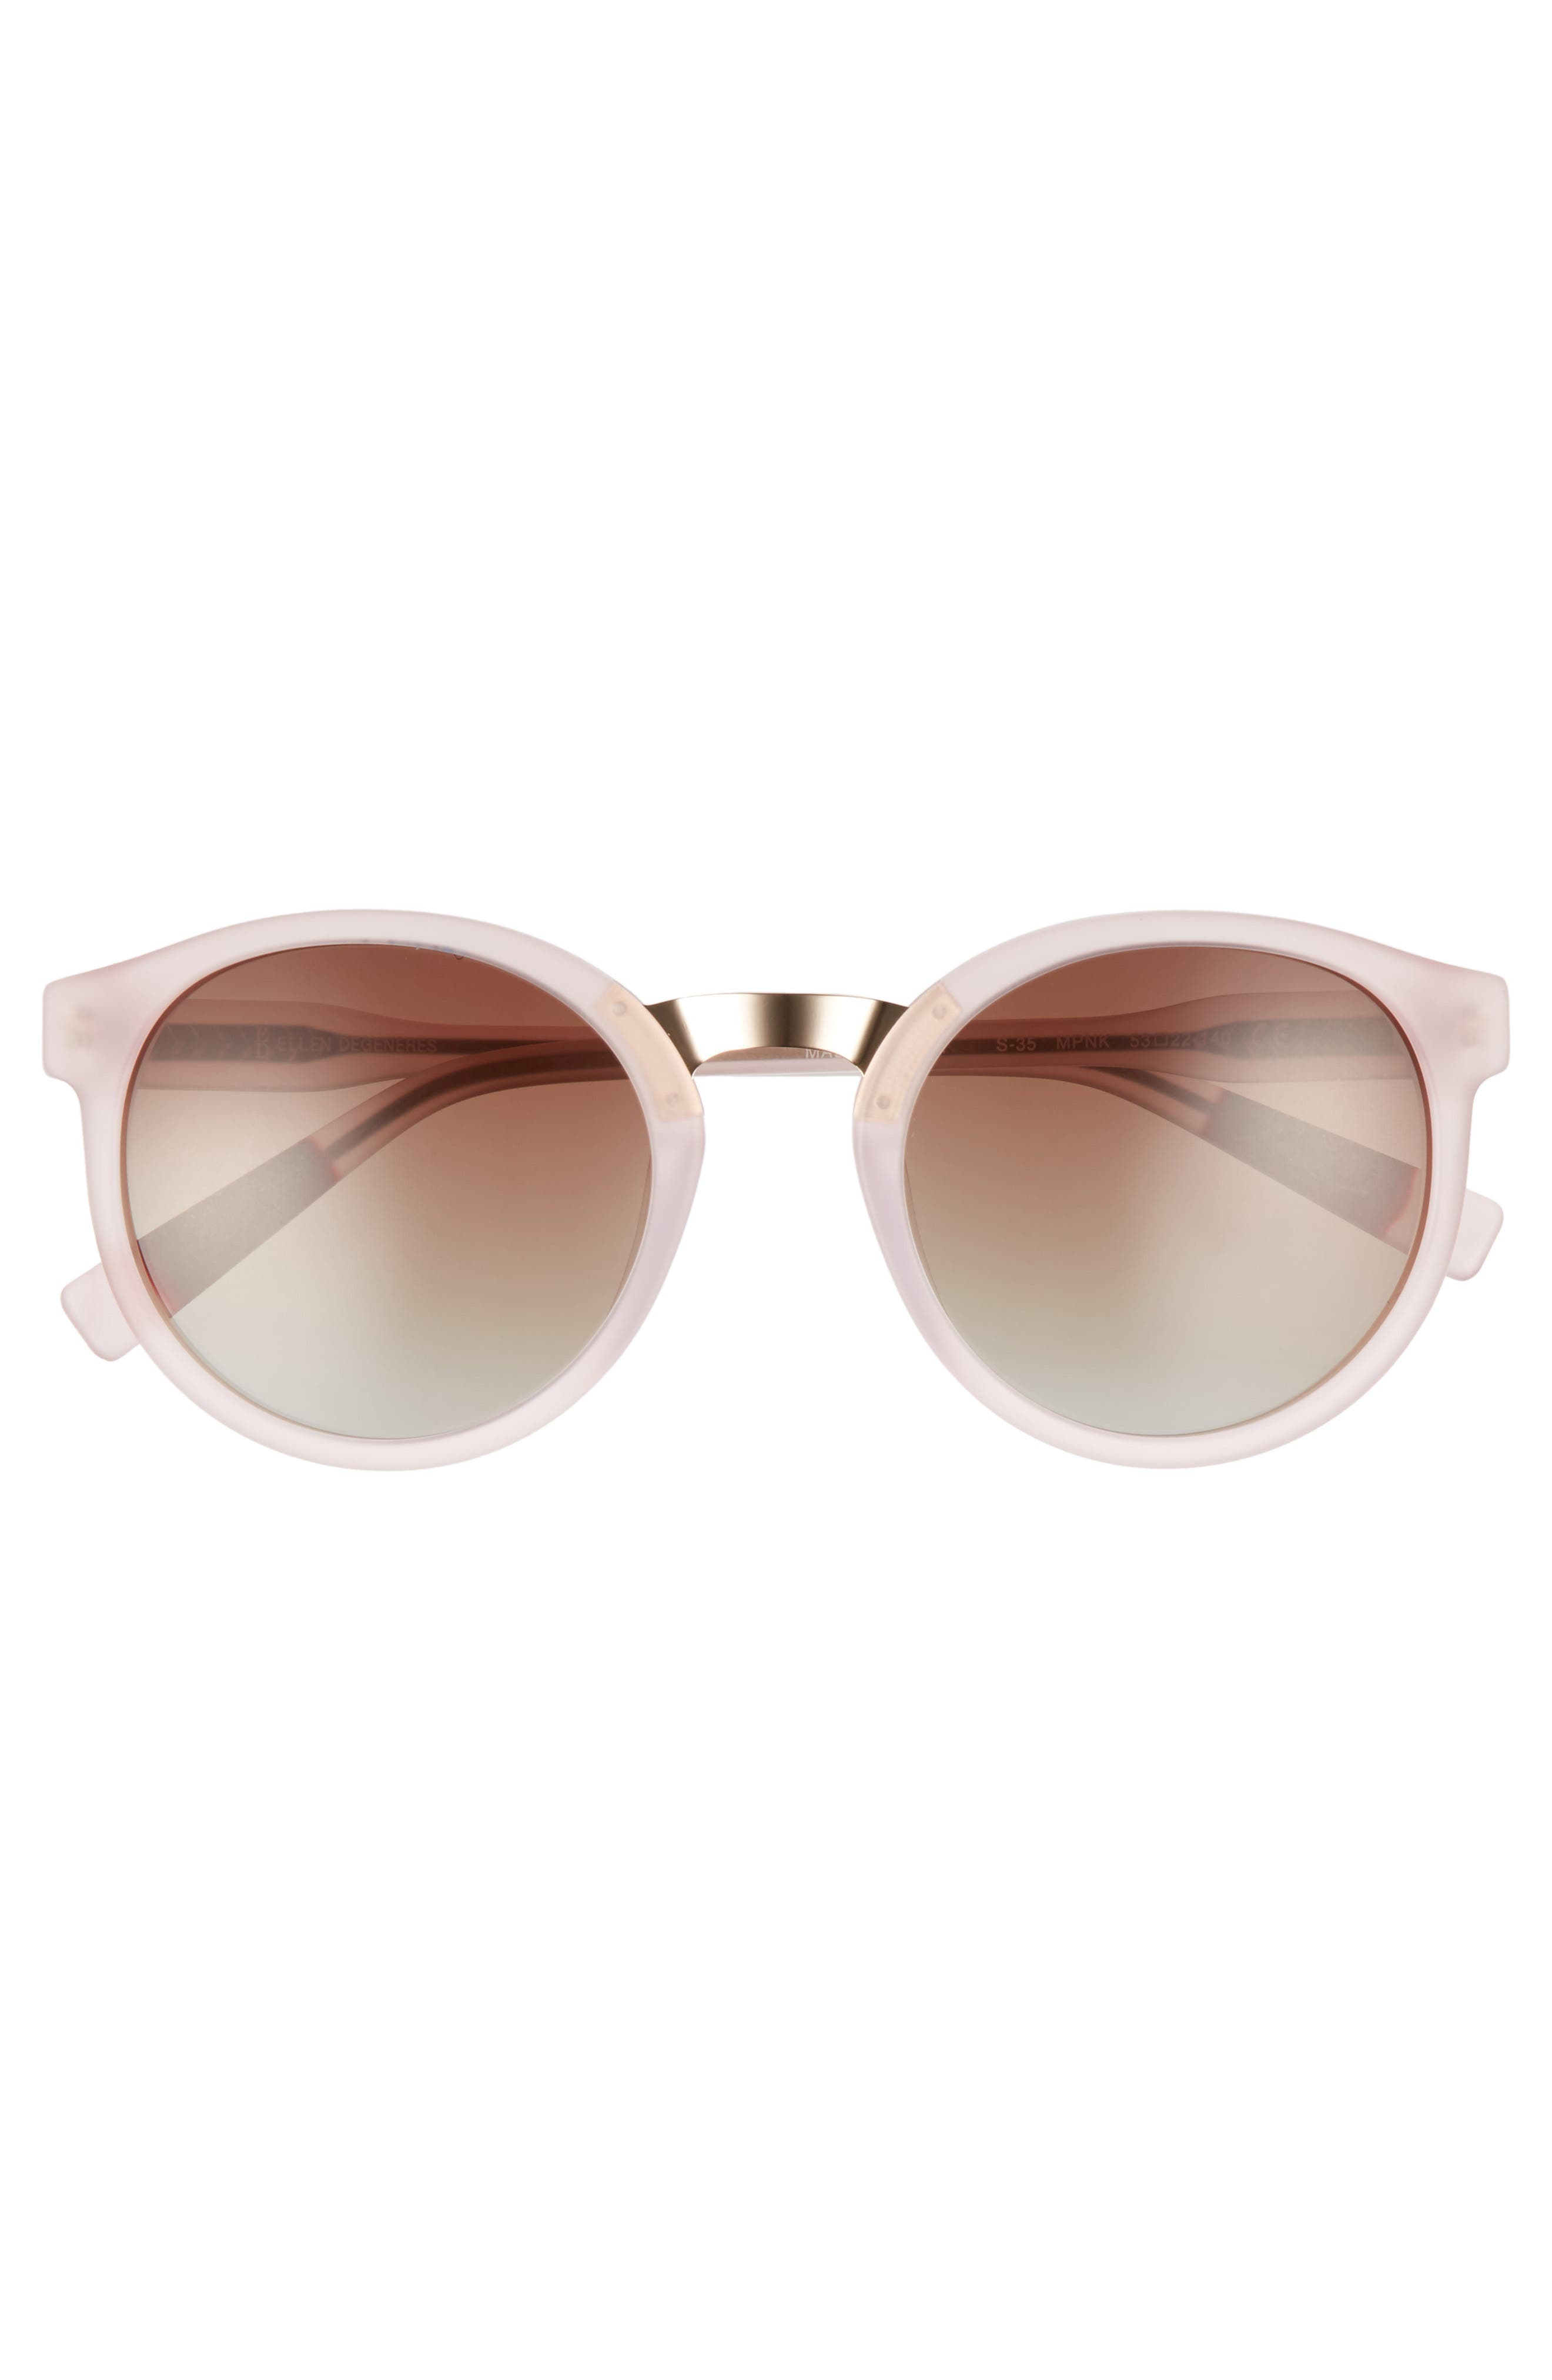 53mm Round Sunglasses,                             Alternate thumbnail 12, color,